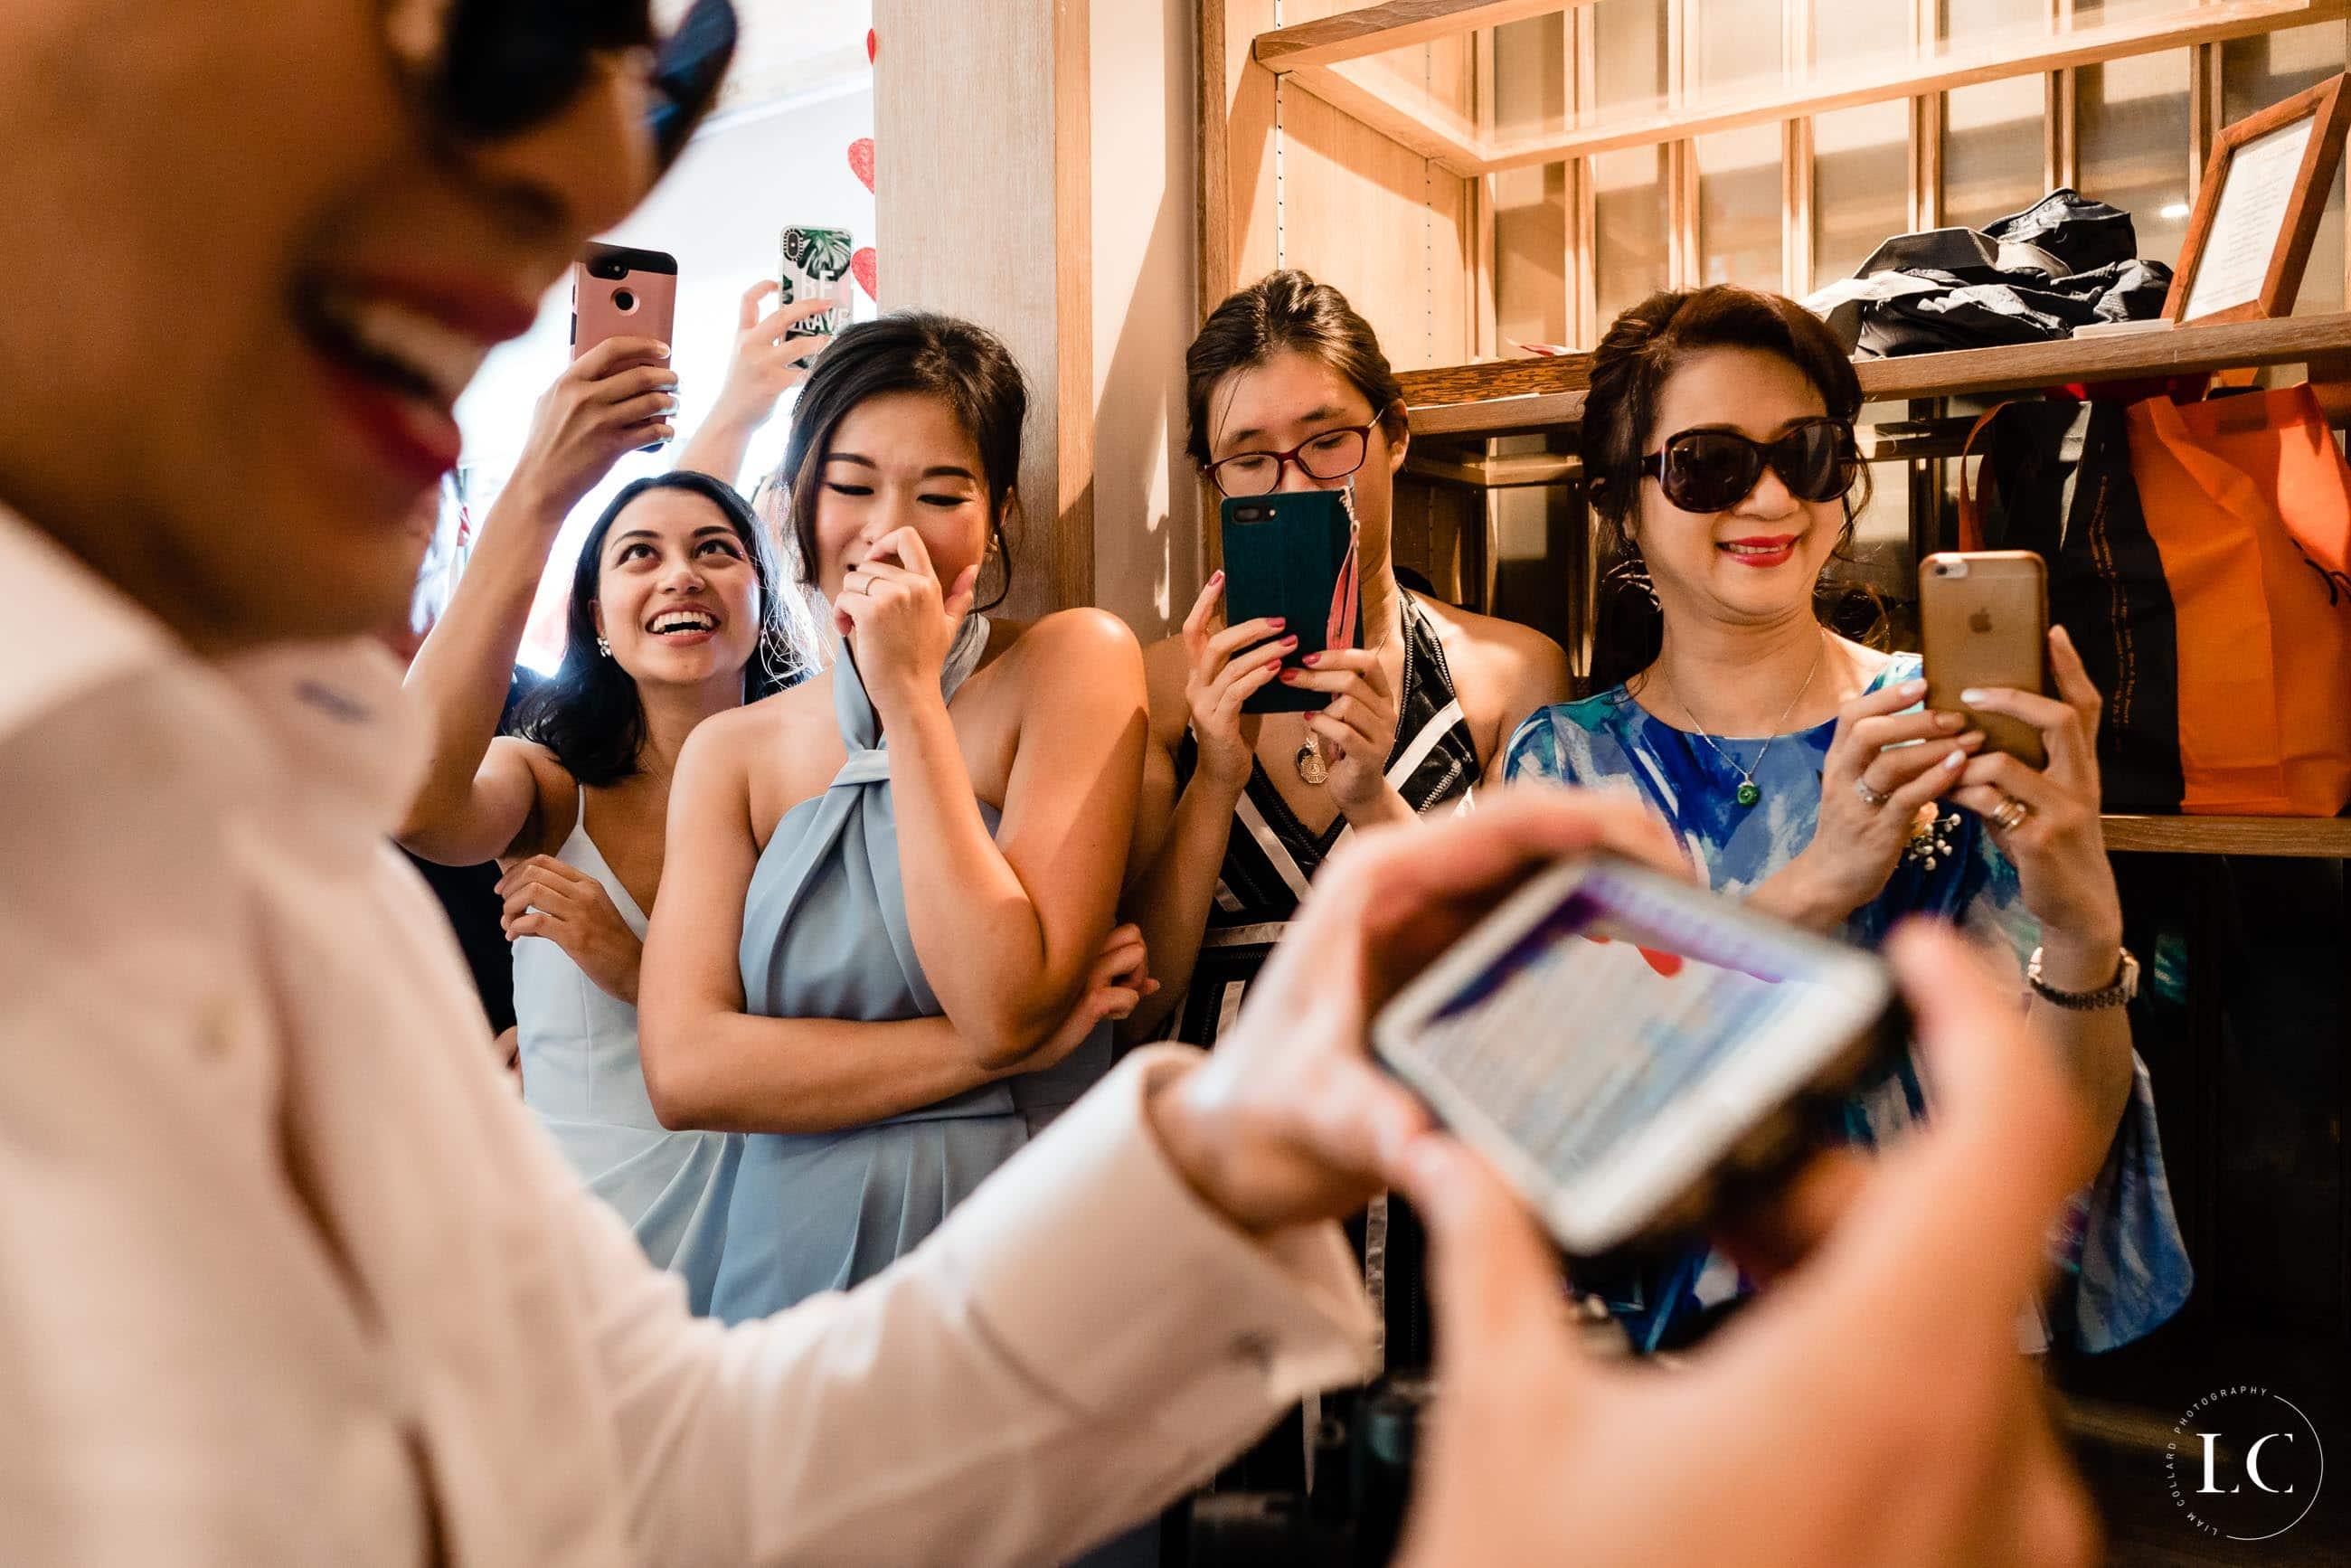 Guests taking photos at a wedding